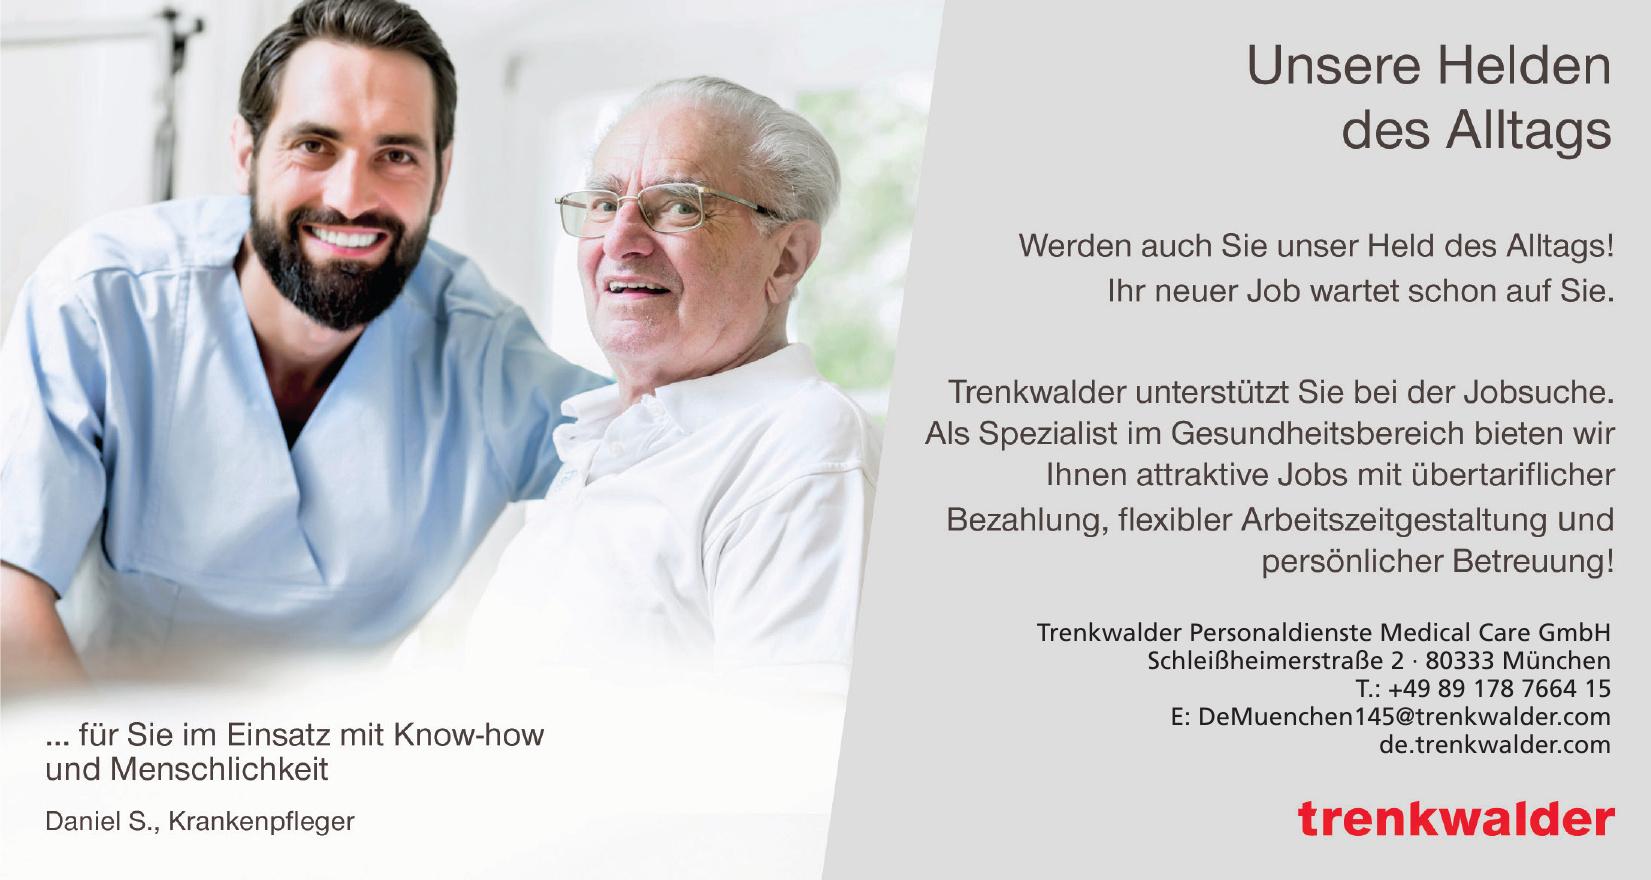 Trenkwalder Personaldienste Medical Care GmbH